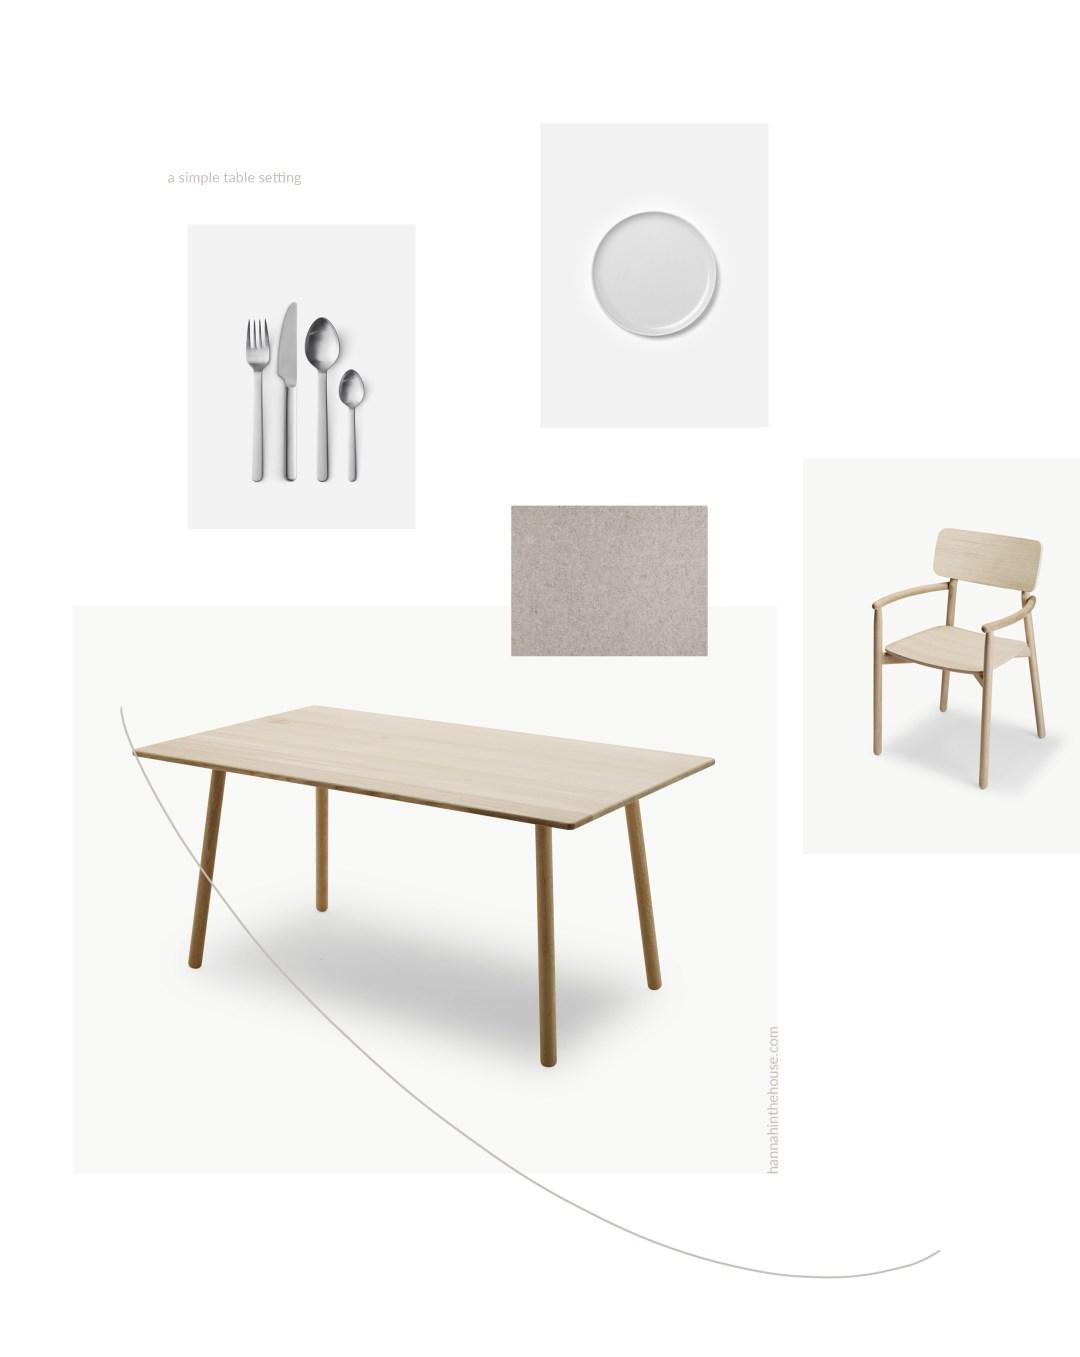 Simple Scandinavian table setting